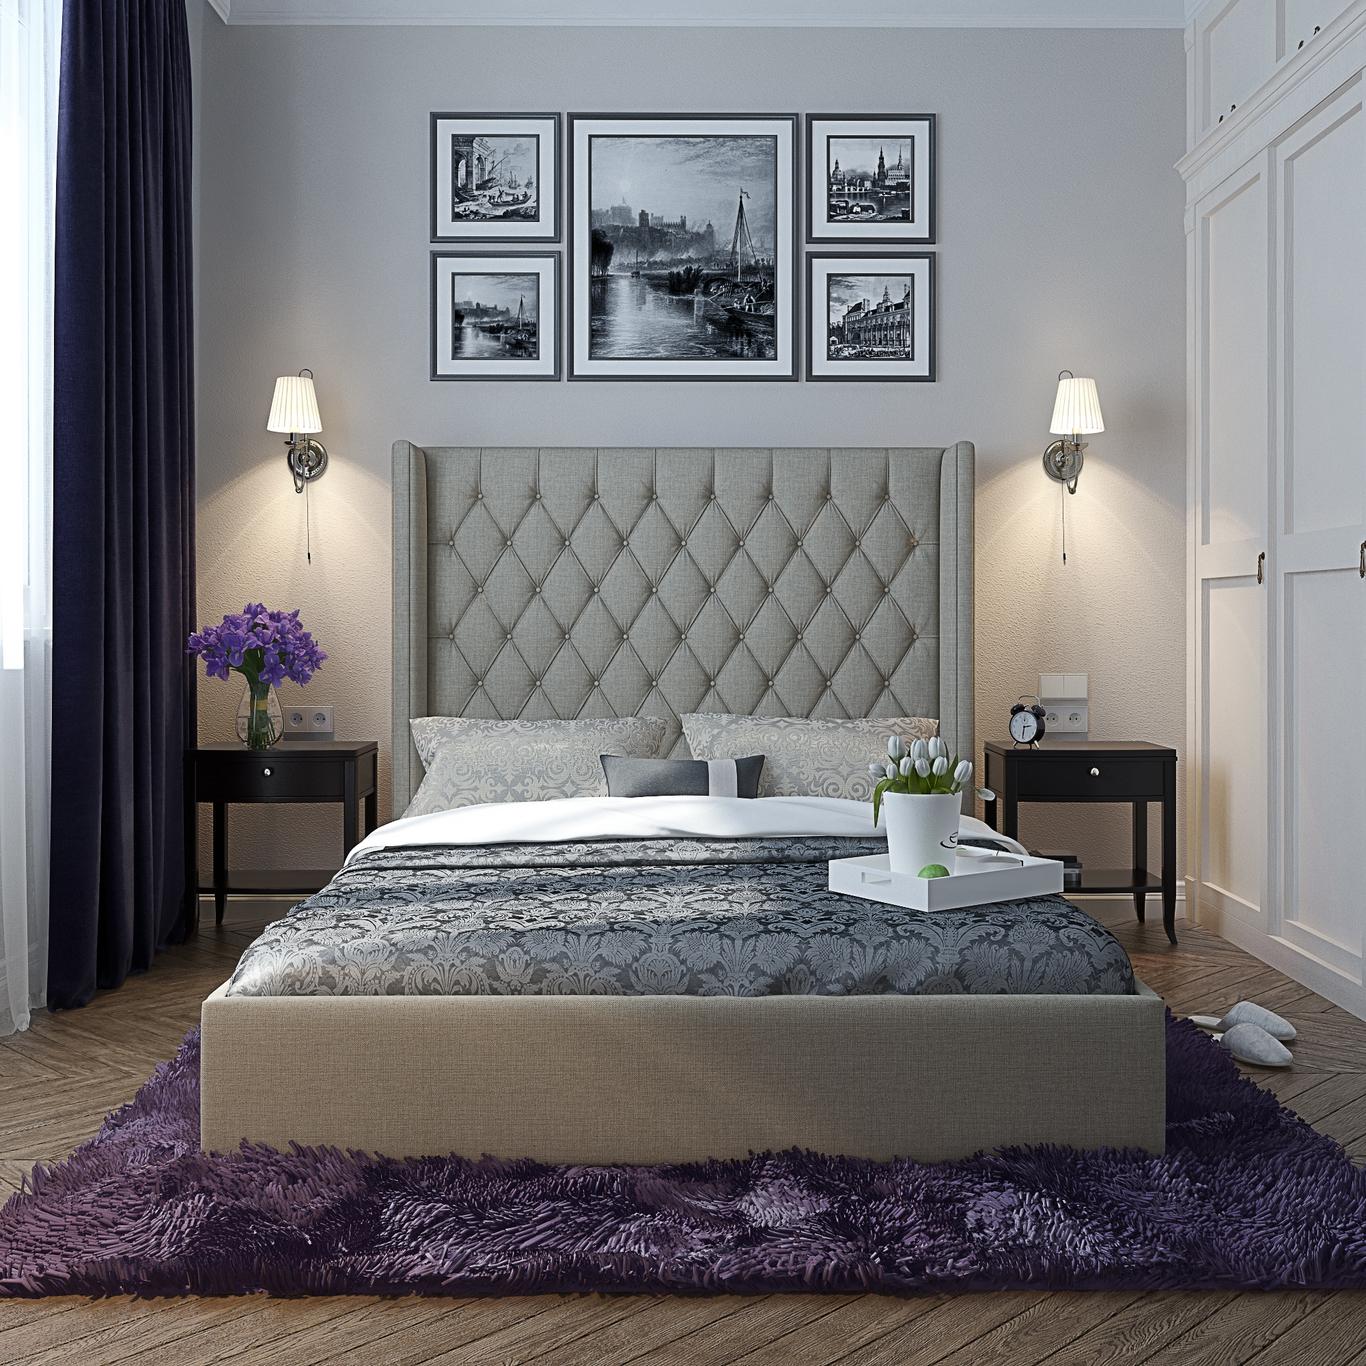 Alexkuzmin bedroom in modern cl 1 f6a13784 hprs